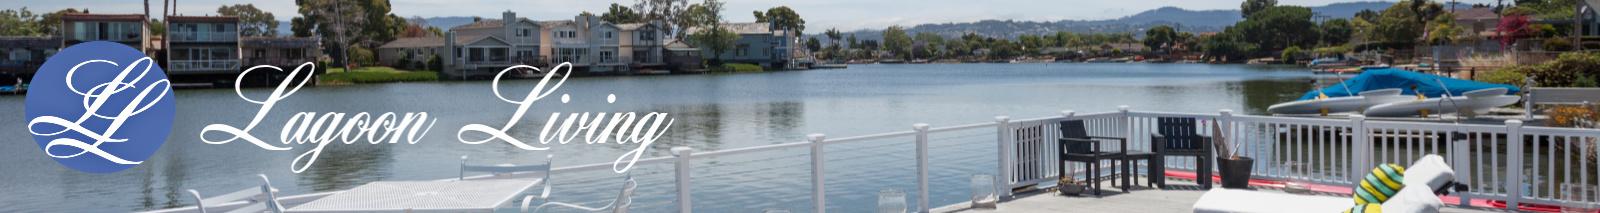 Community and Real Estate on the San Mateo Peninsula Lagoons